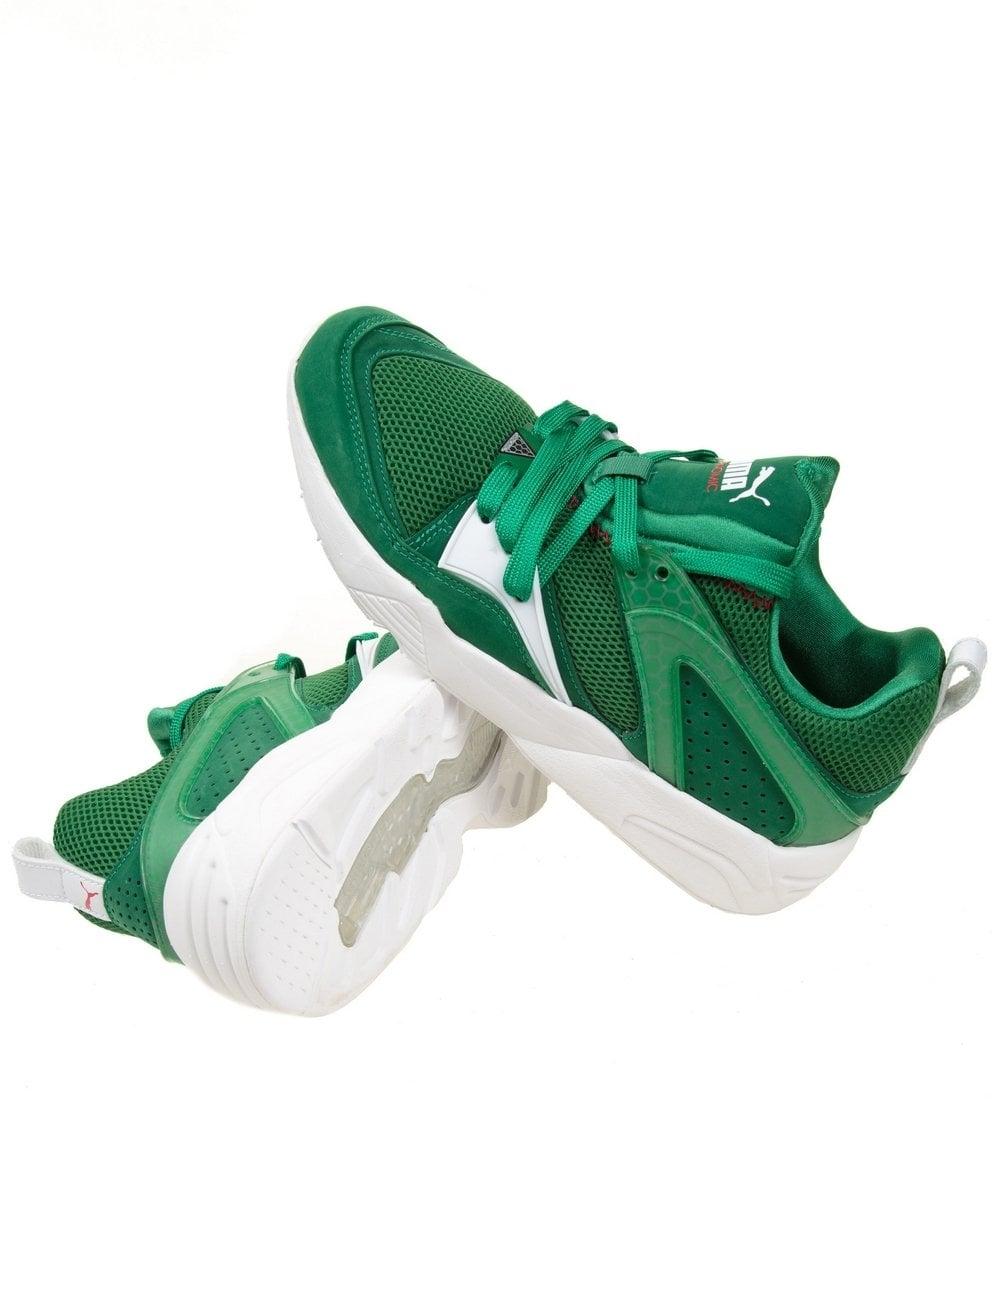 nouveau concept 36107 559b0 Blaze of Glory (Green Box Pack) - Amazon Green